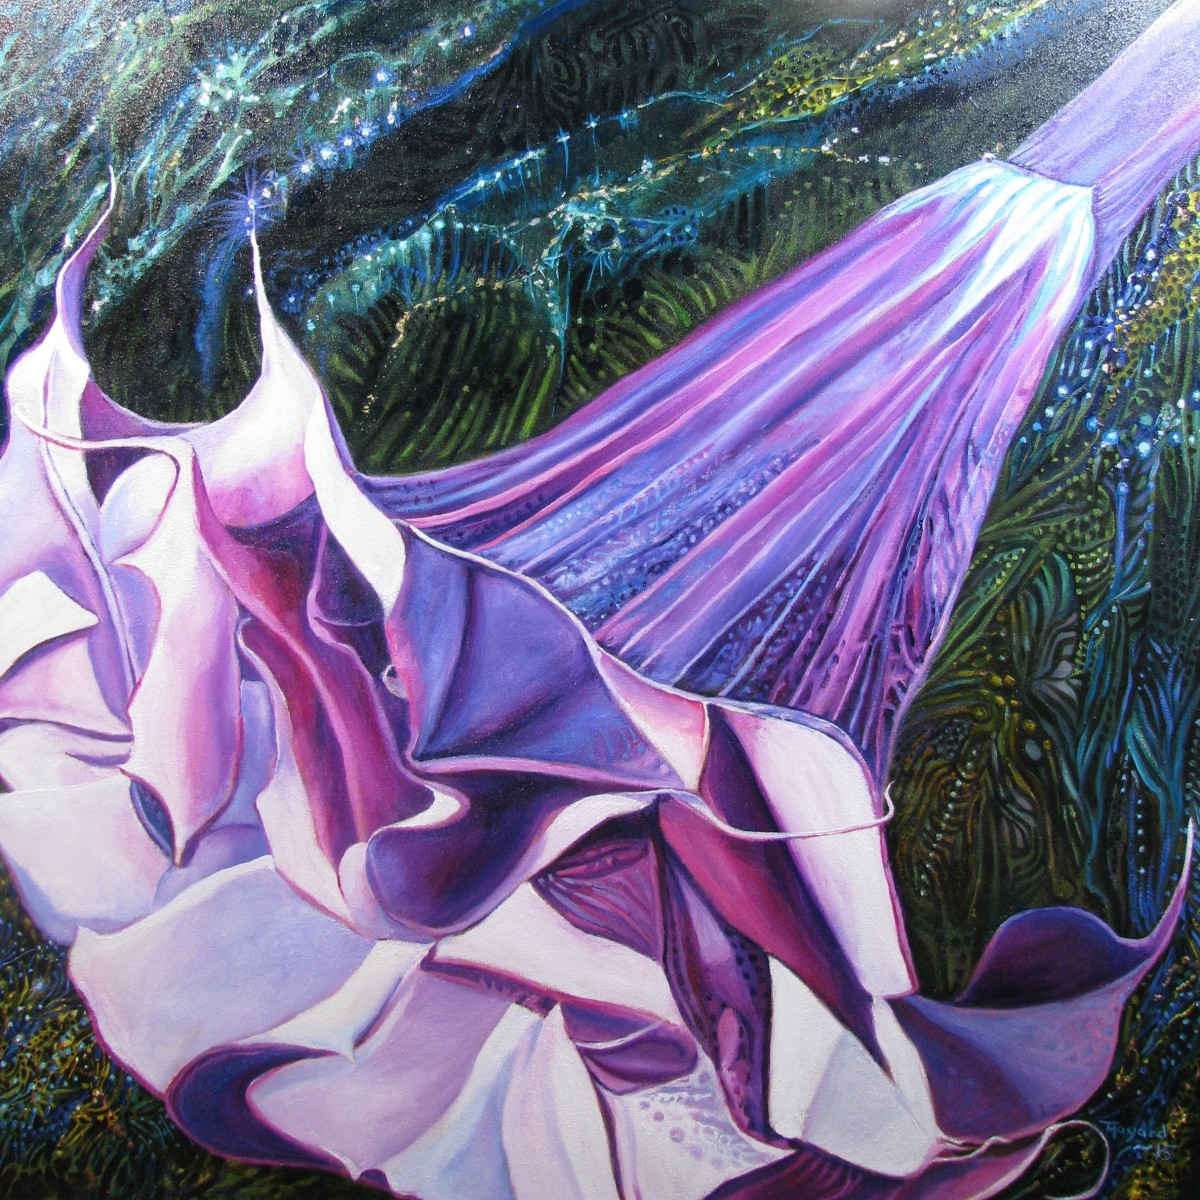 Purple Angel's Trumpet by Tony Mayard